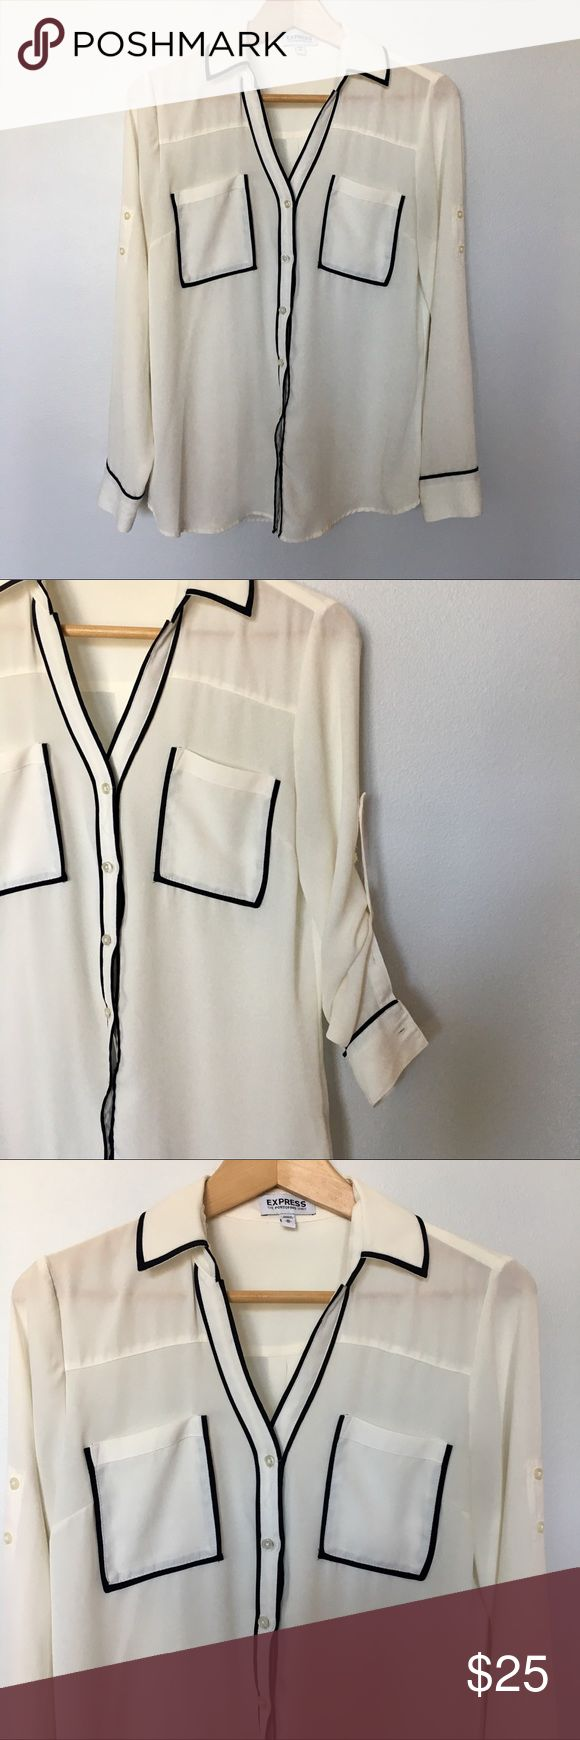 EXPRESS Portifino Shirt The classic original fit EXPRESS Portofino shirt in a sh…